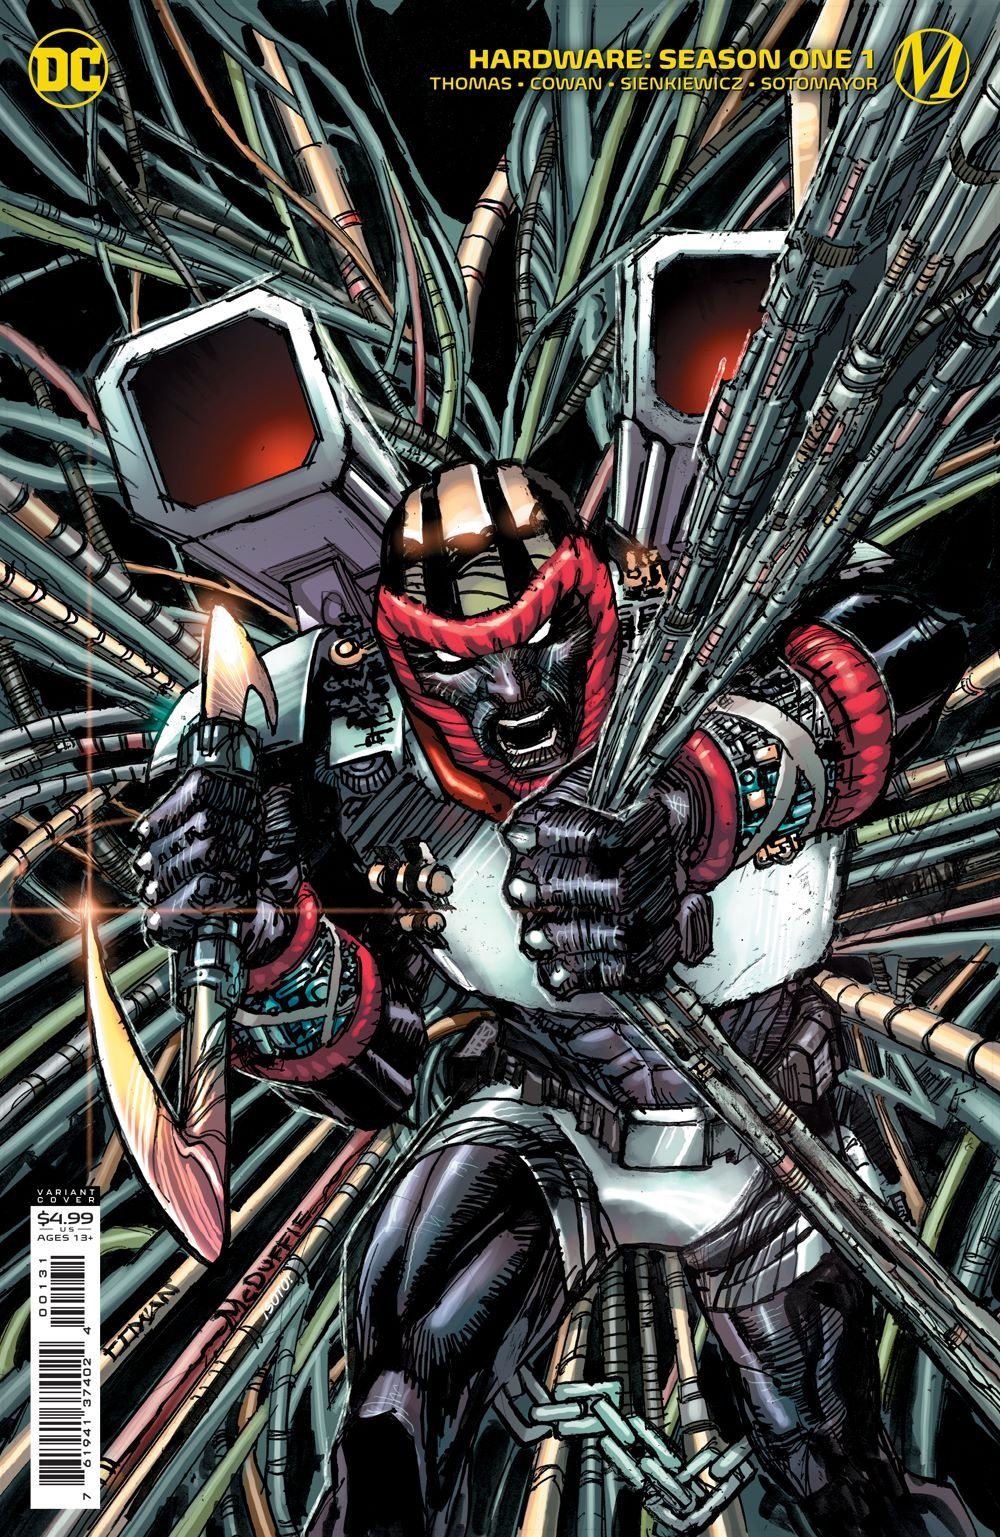 HARDWARE_S1_Cv1_Var02 DC Comics August 2021 Solicitations